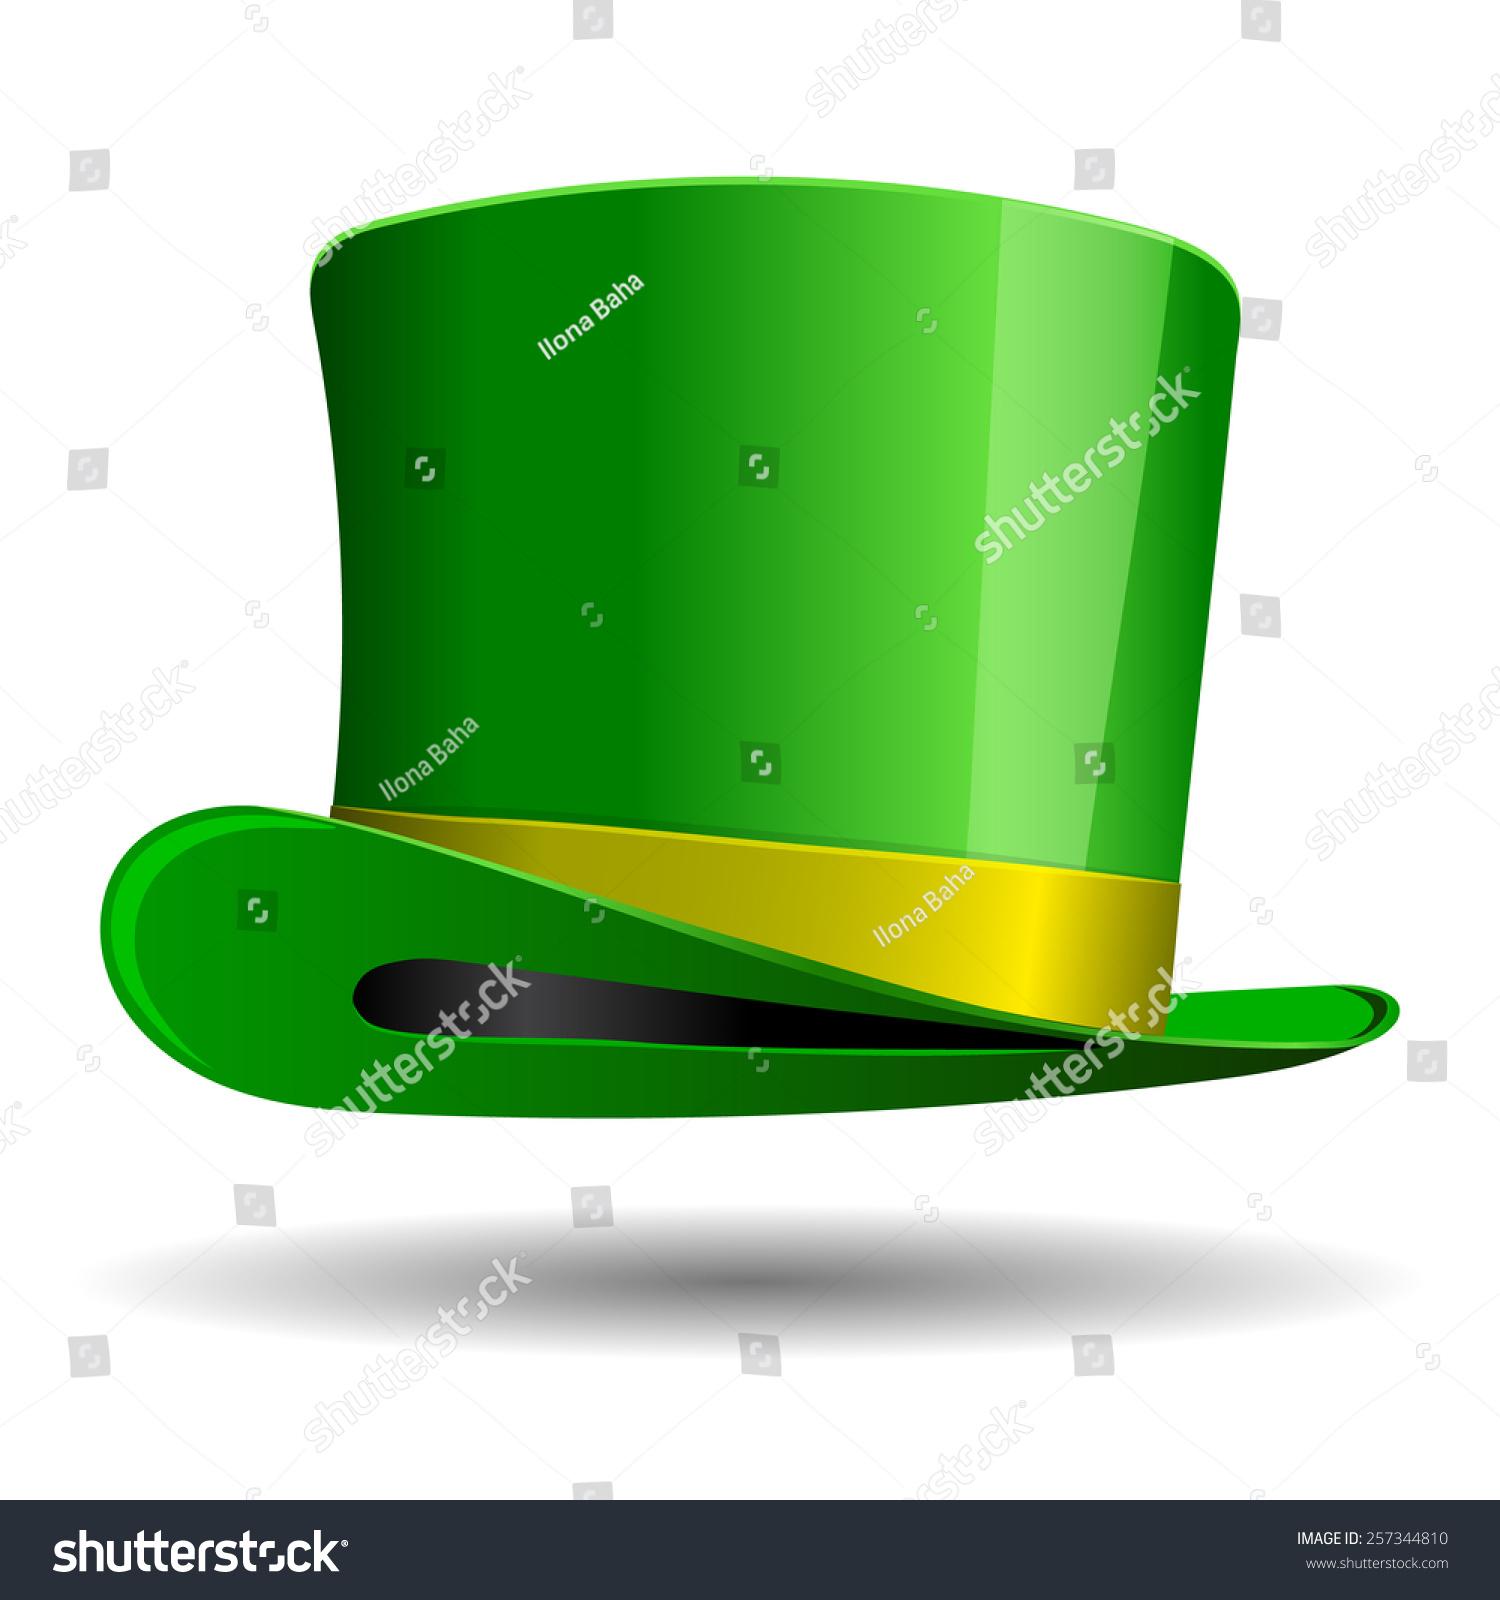 green st patrick day hat vector stock vector 257344810 shutterstock